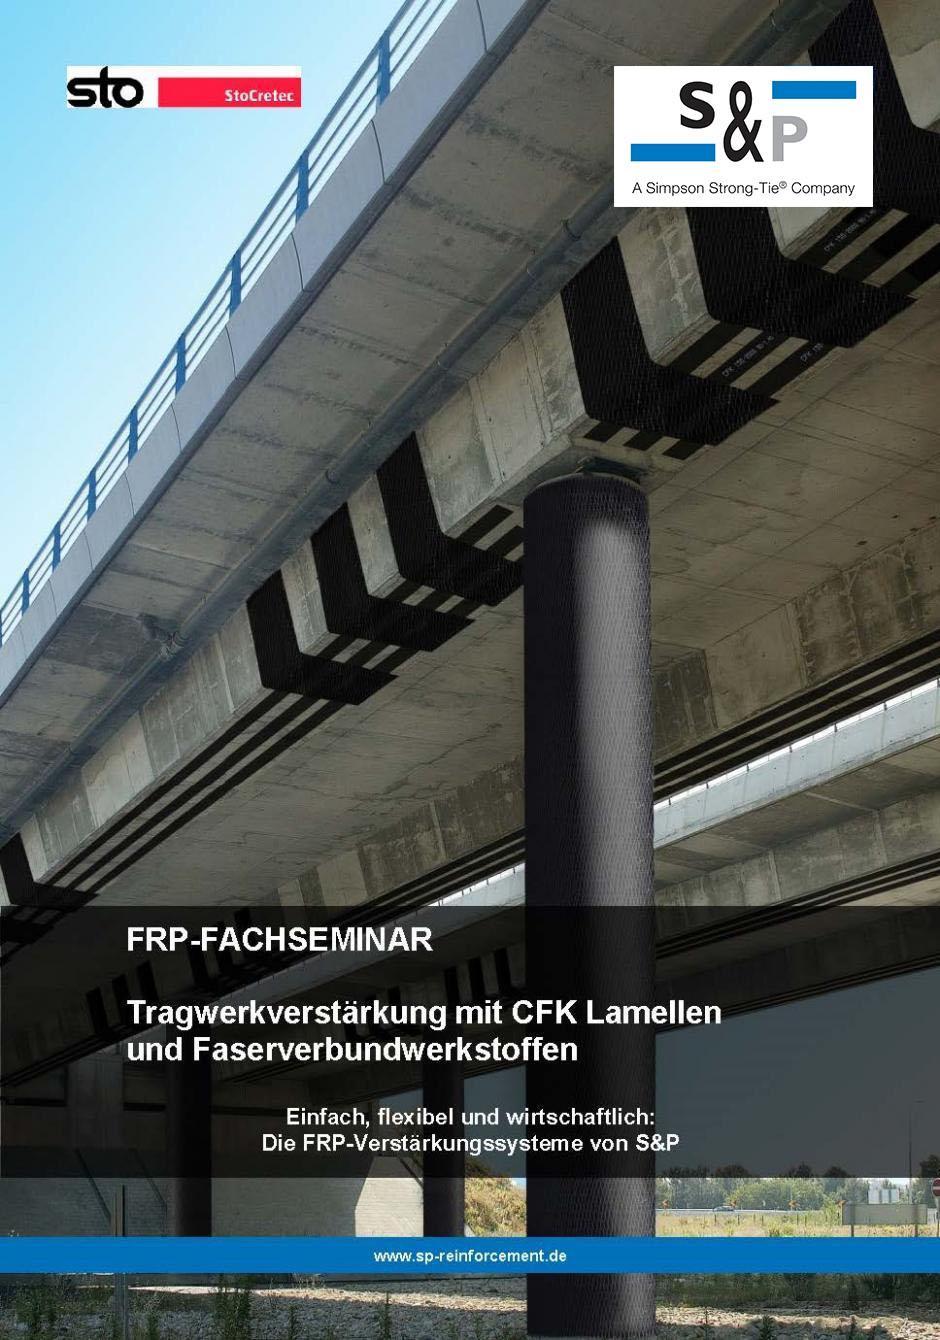 FRP Seminar in Nürnberg